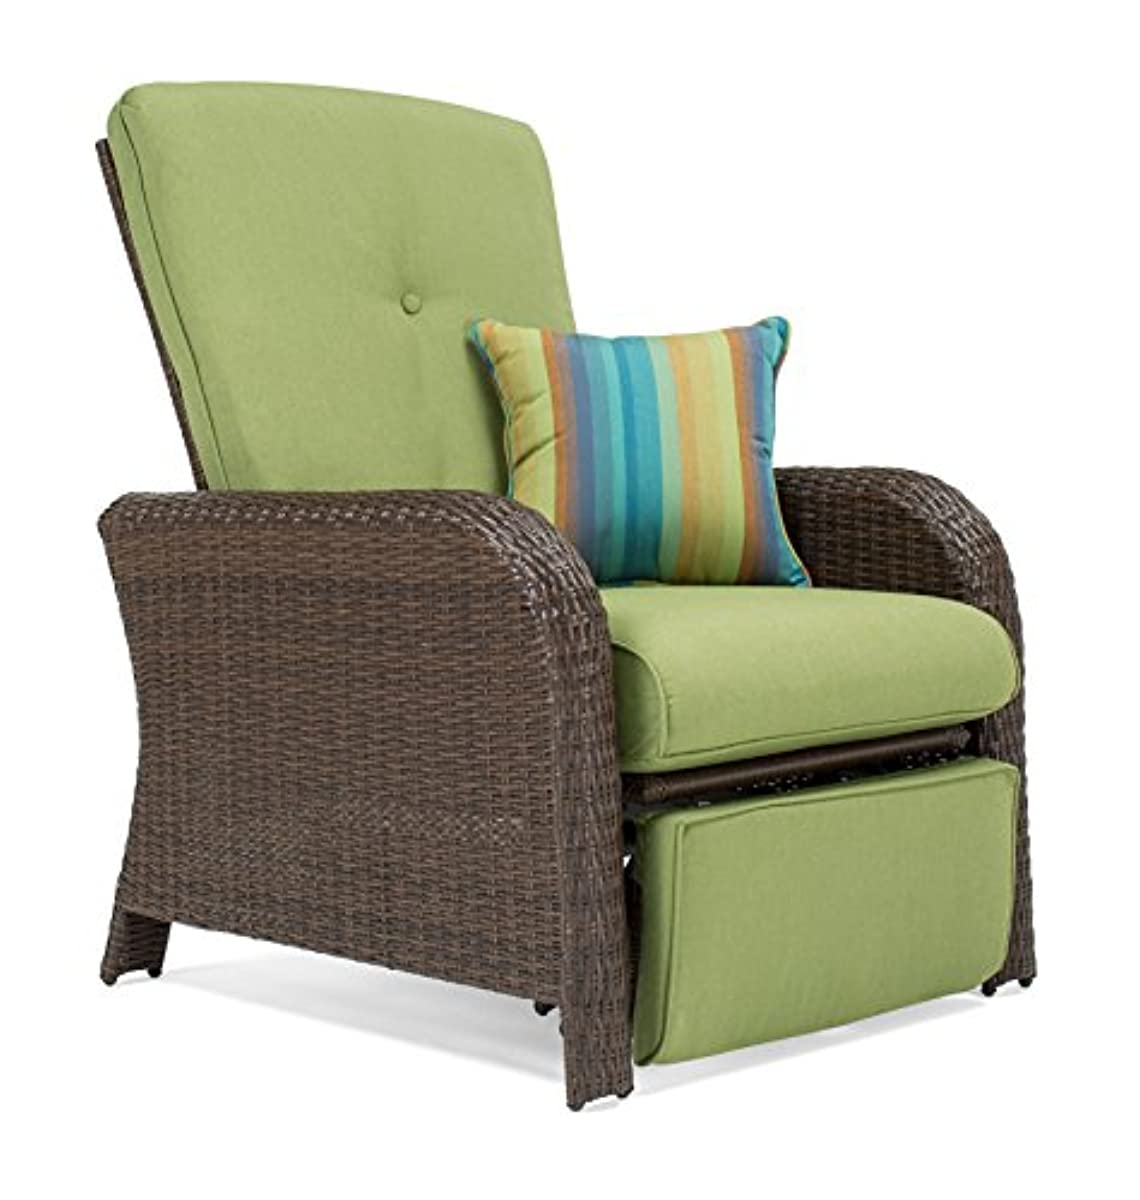 La Z Boy Outdoor Sawyer Resin Wicker Patio Furniture